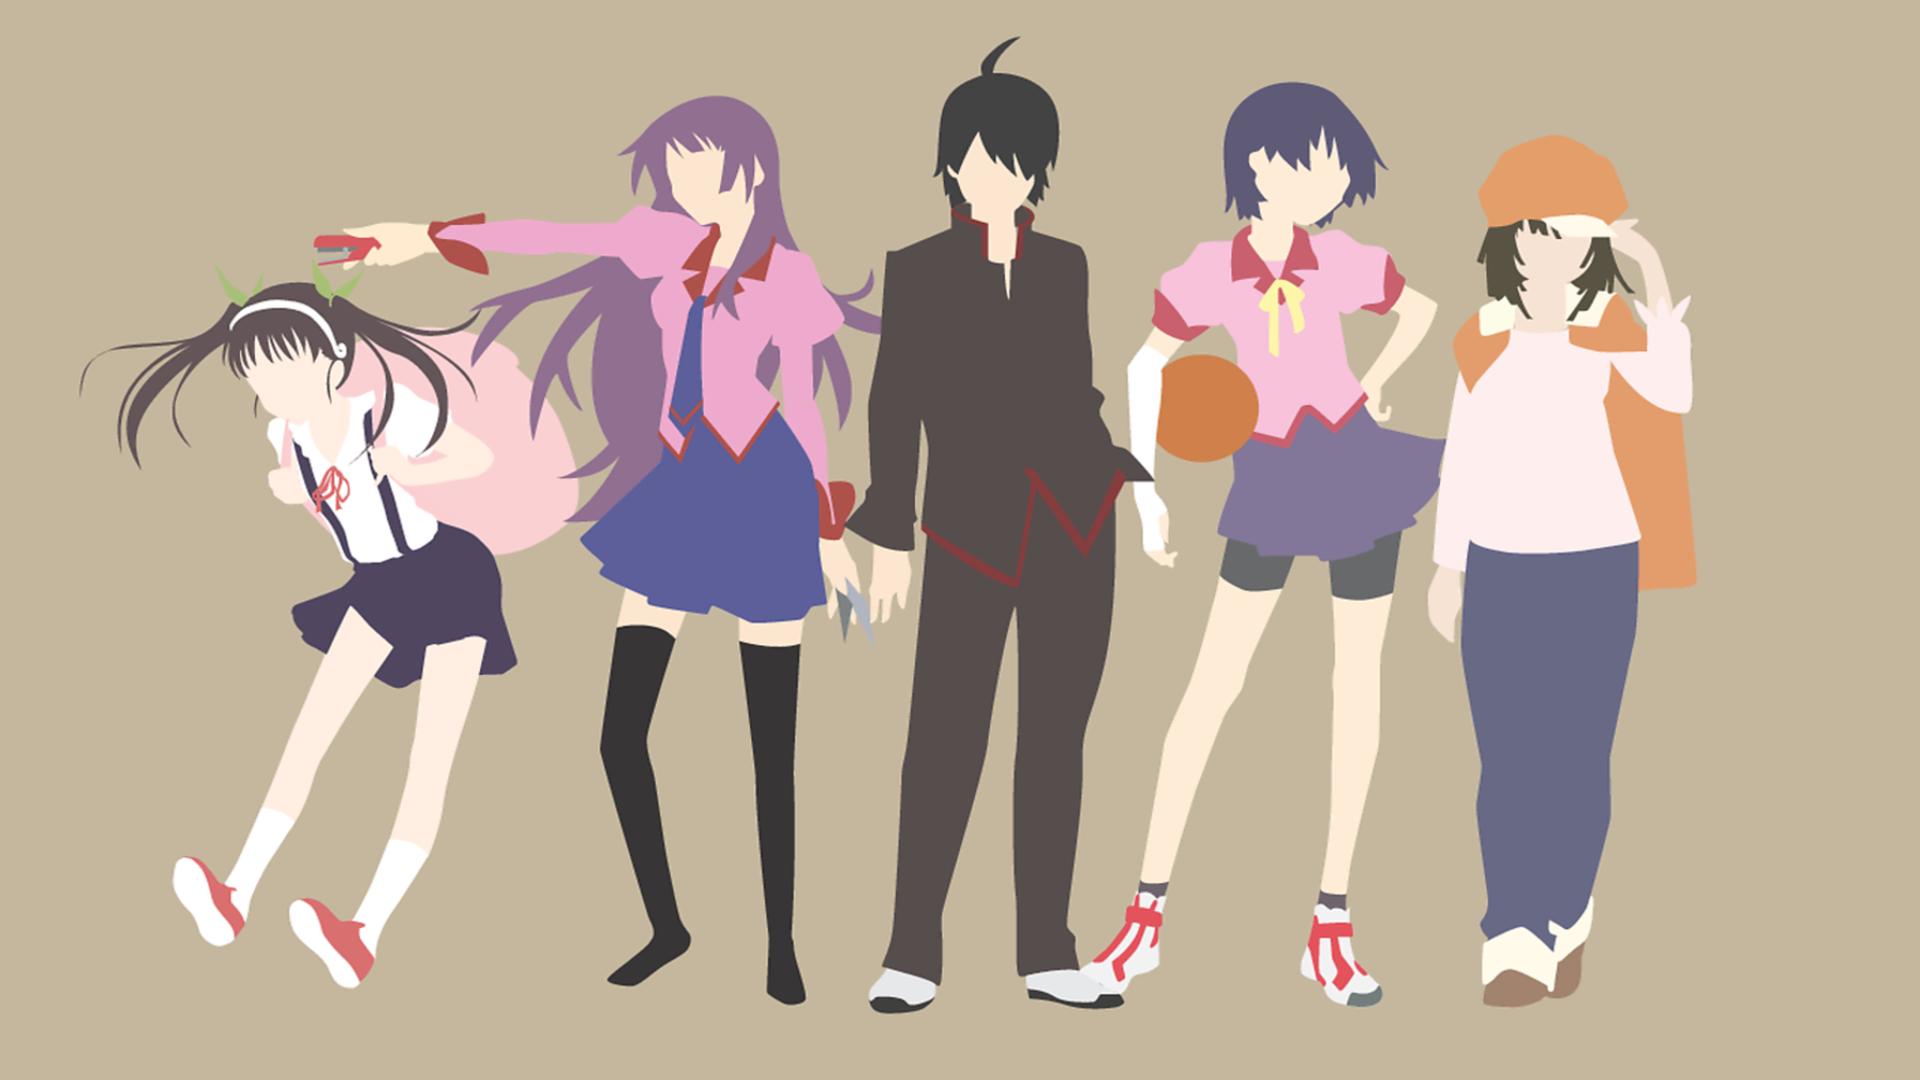 Bakemonogatari Wallpapers Hd - R Anime - HD Wallpaper